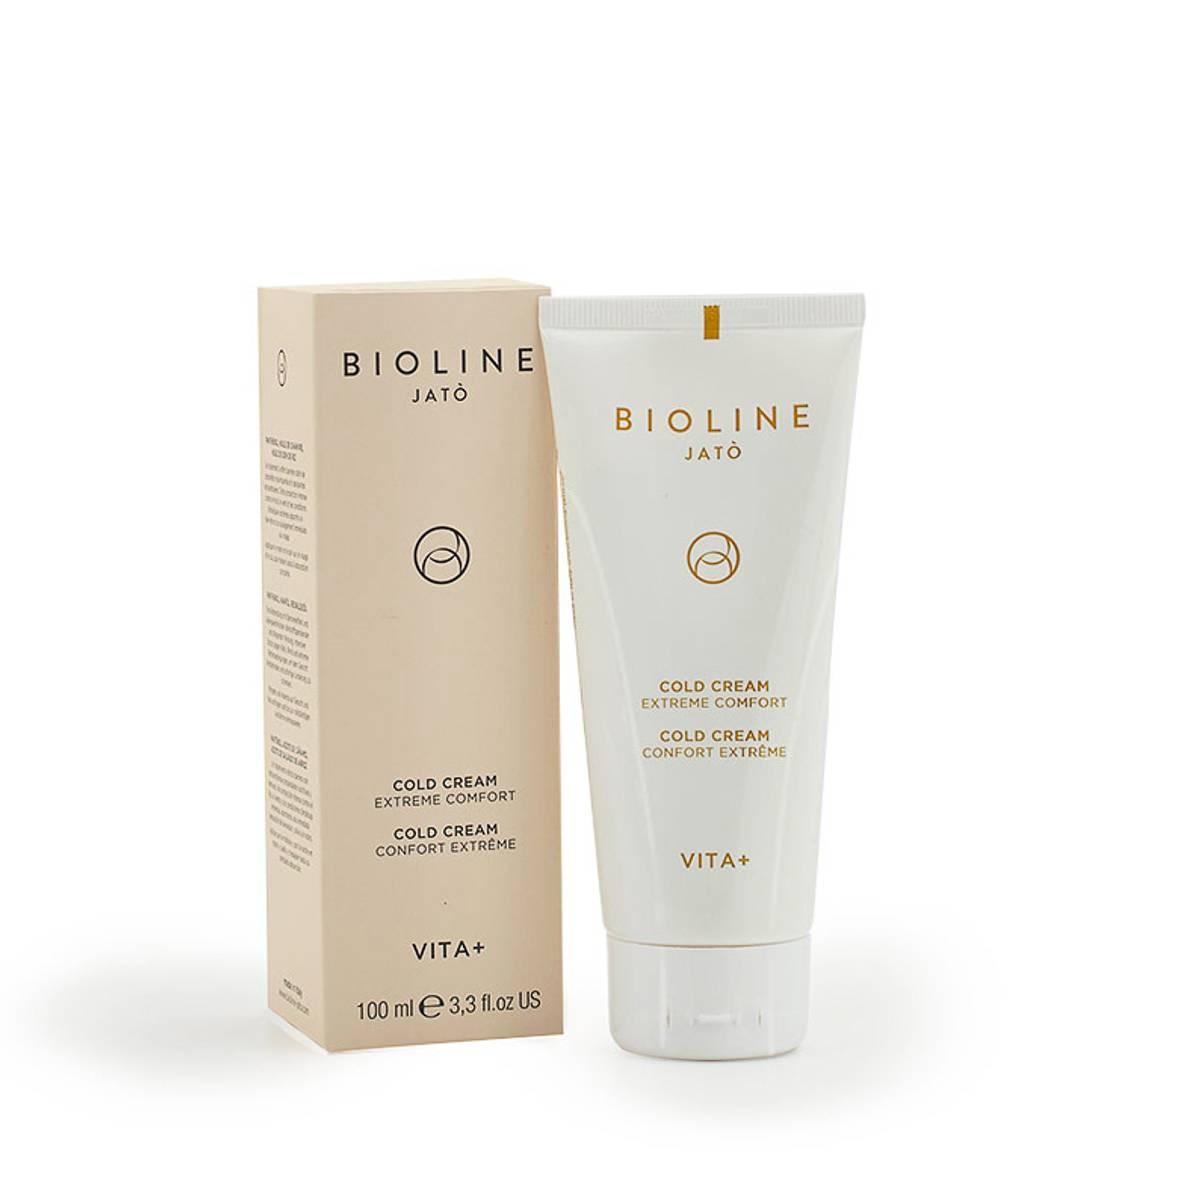 Bioline Vita+ Cold Cream 100ml